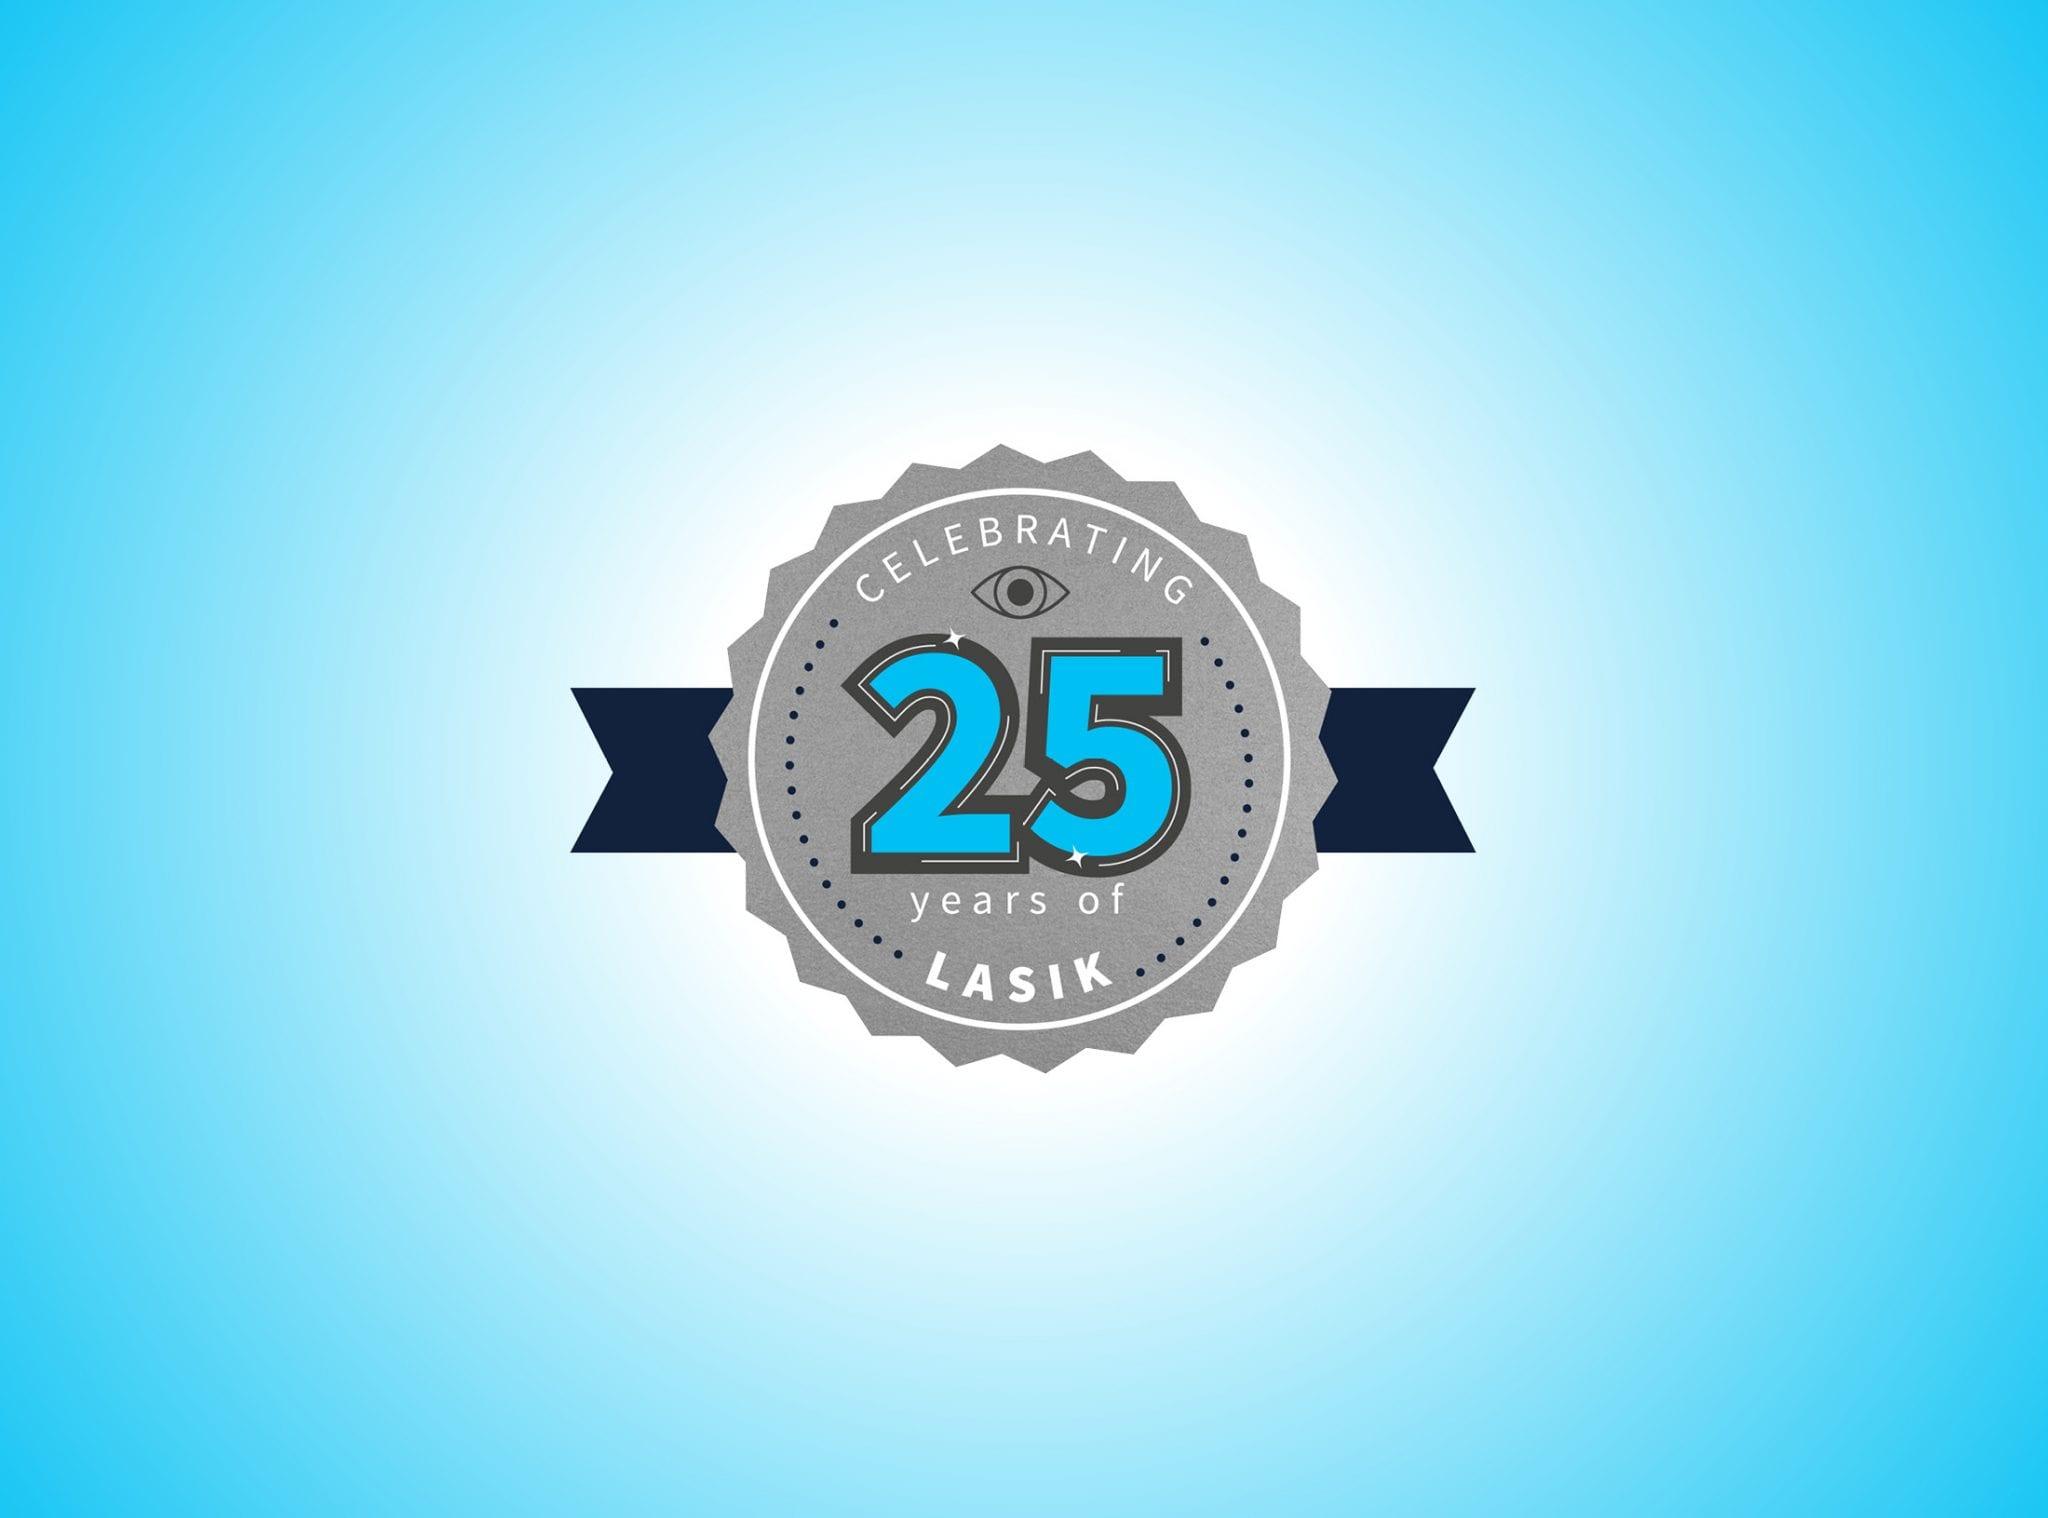 Center For Sight Las Vegas Celebrates 25 of Safe LASIK Surgery